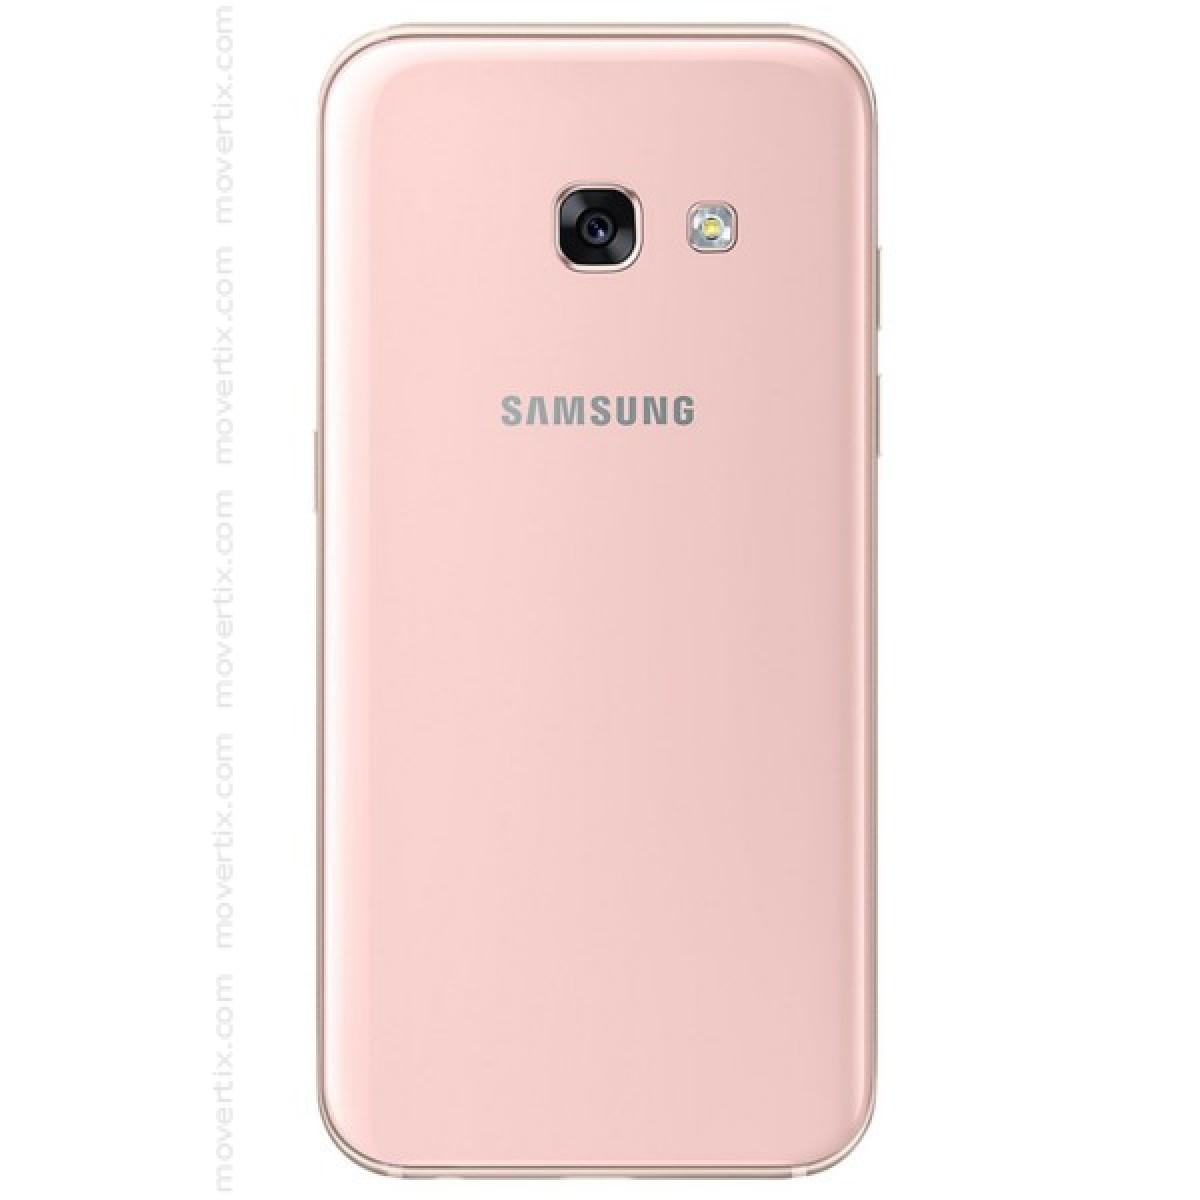 samsung galaxy a3 2017 pink 8806088620268 movertix mobile phones shop. Black Bedroom Furniture Sets. Home Design Ideas